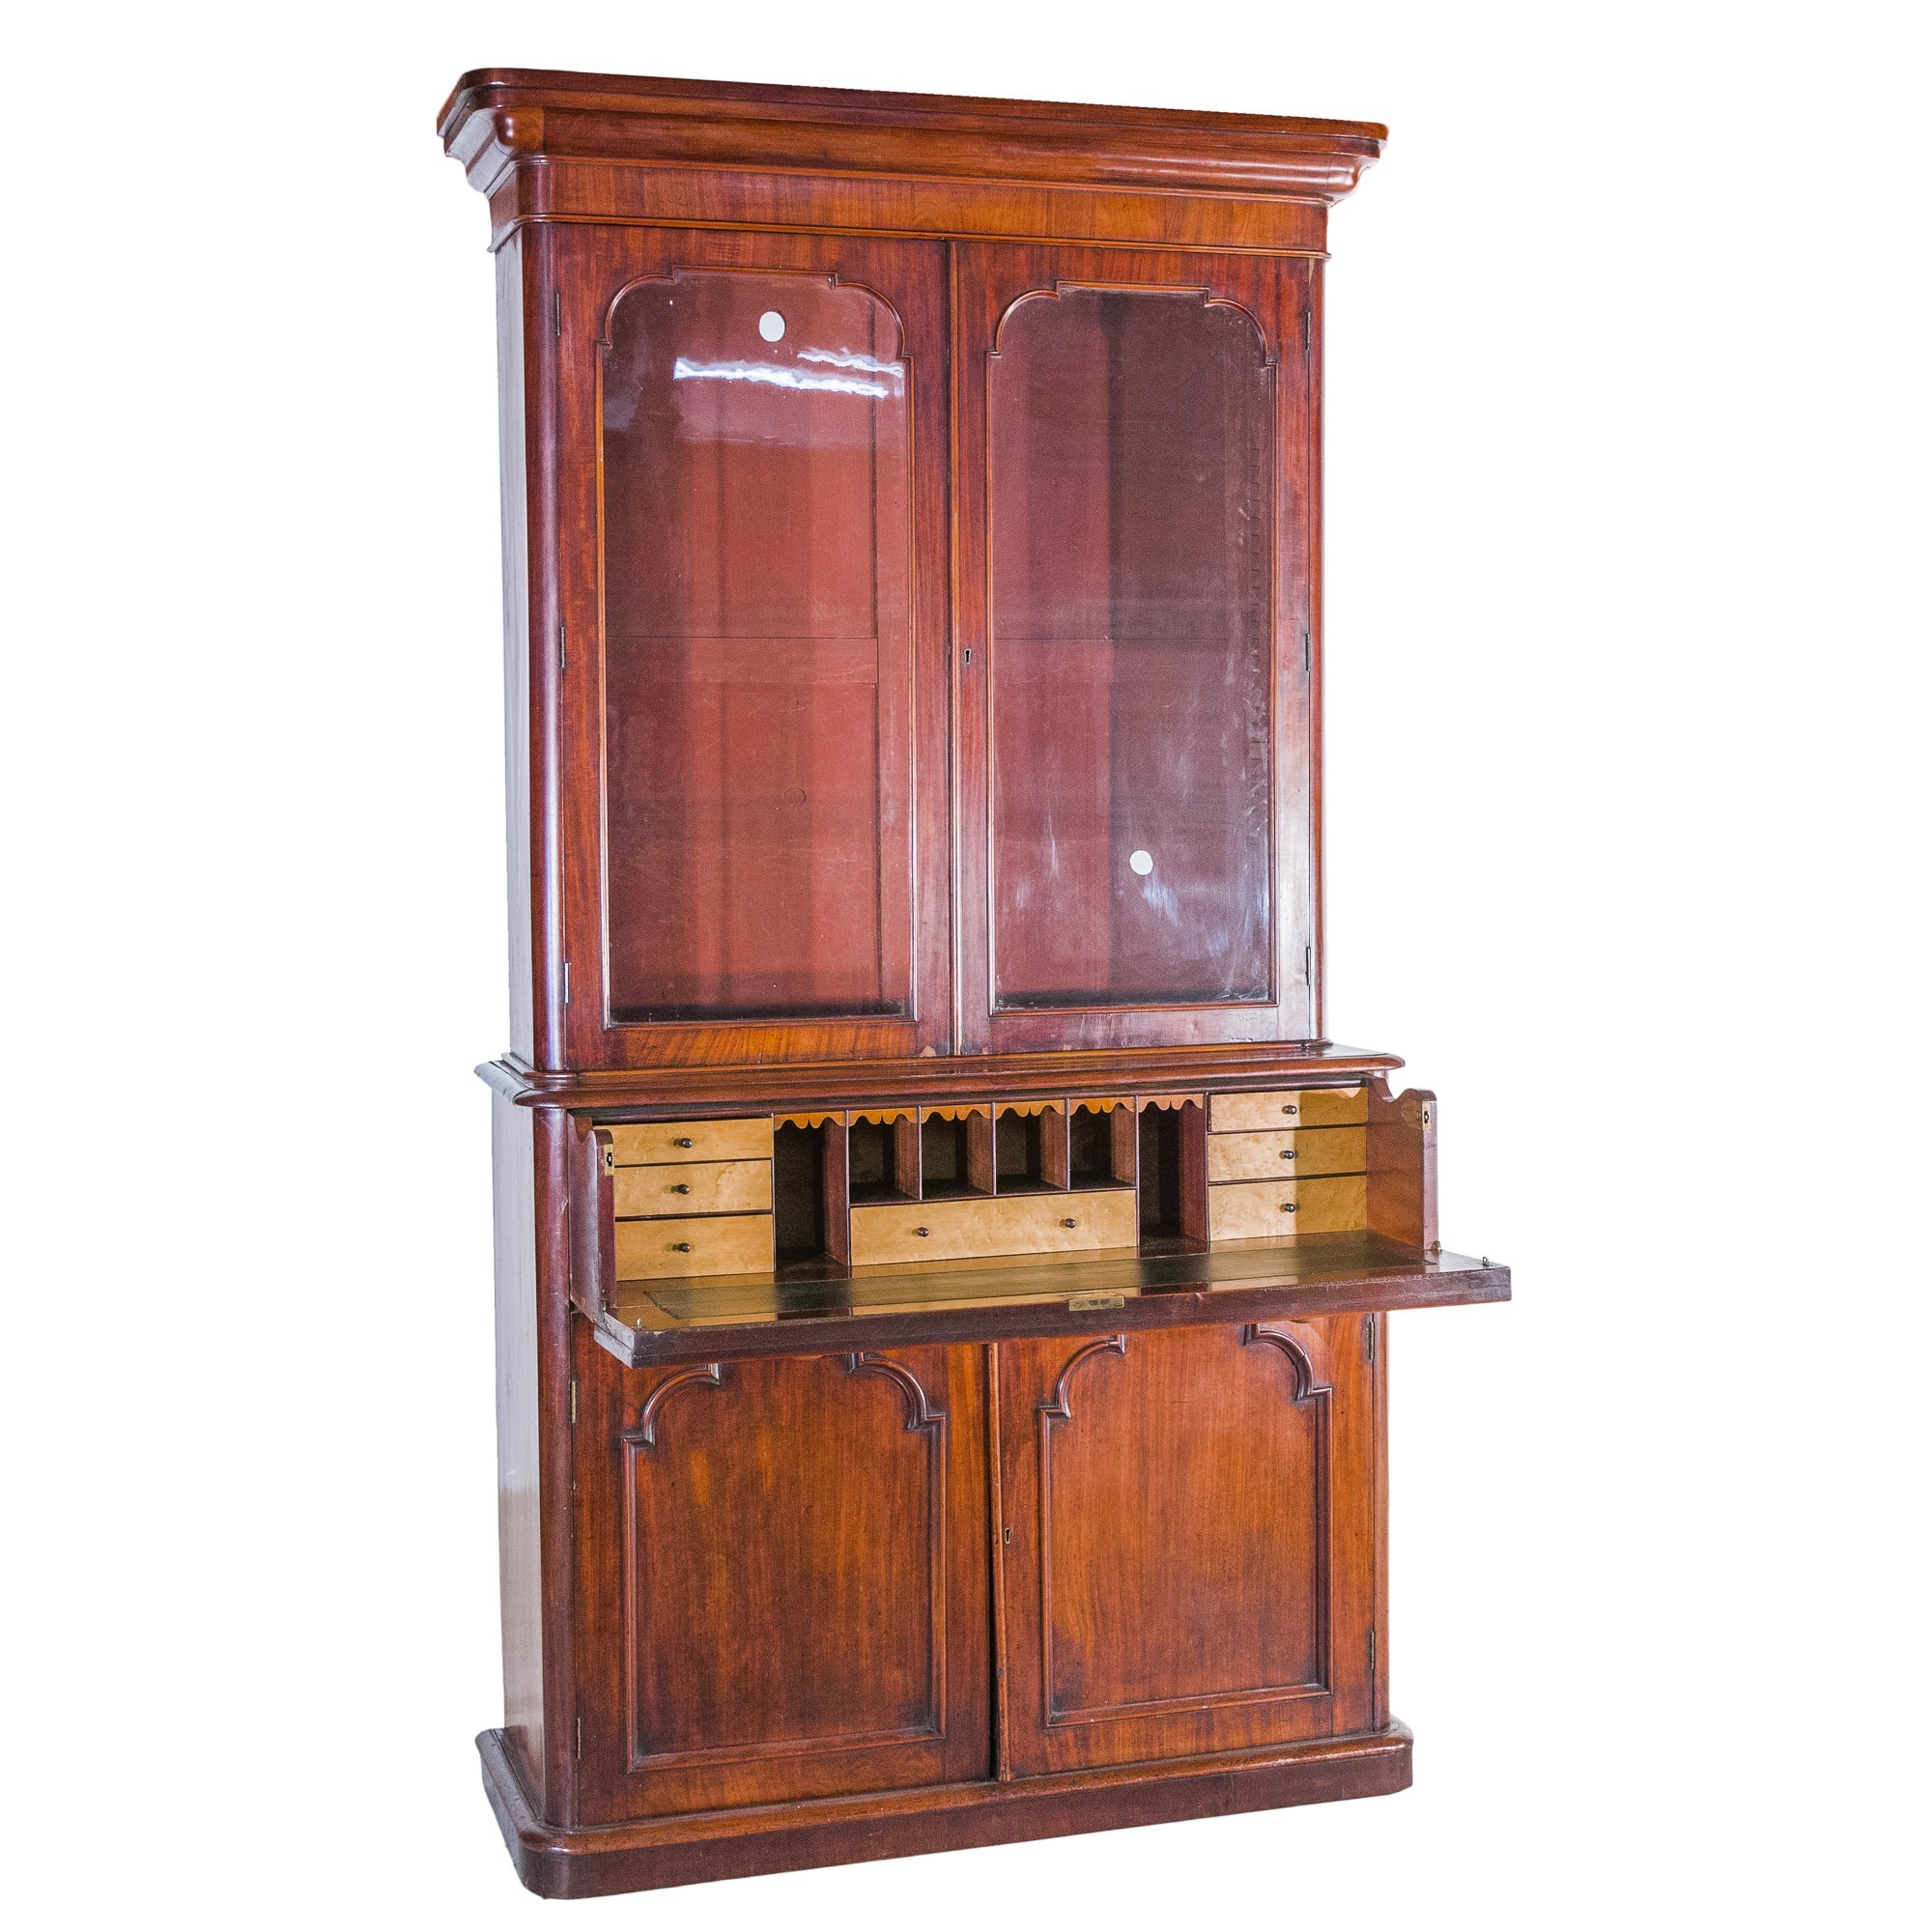 'Victorian Mahogany Secretaire Bookcase with Birdseye Maple Veneered Interior'